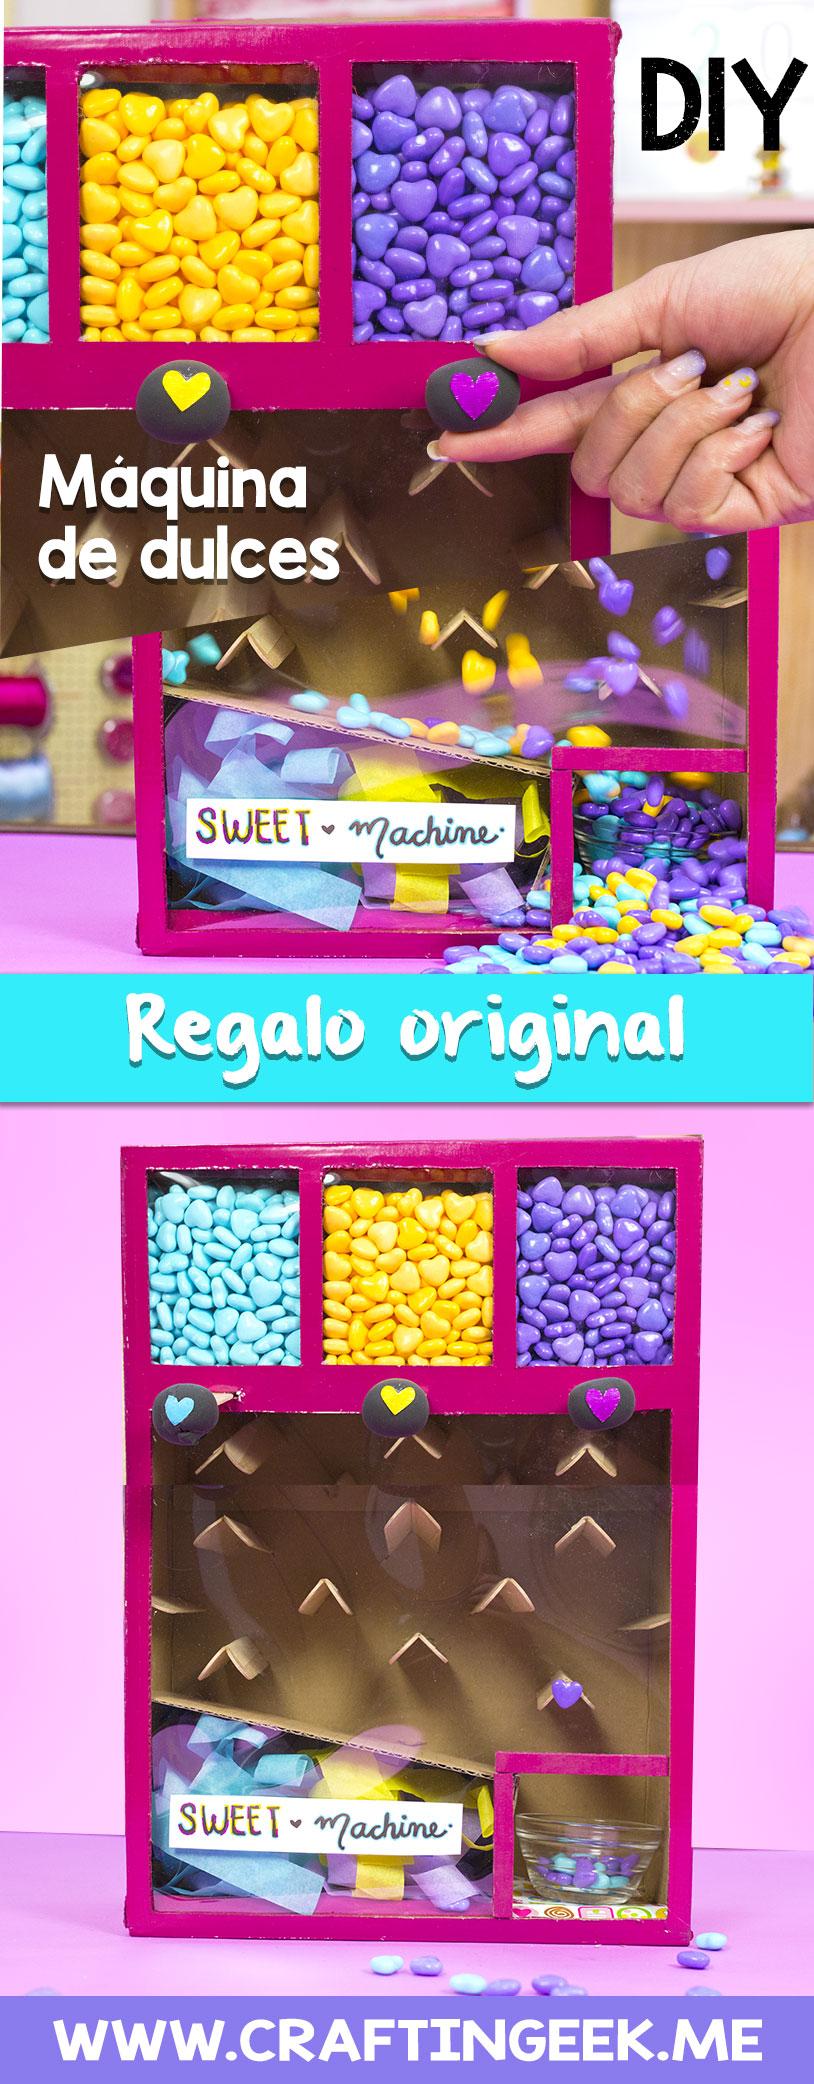 maquina de dulces diferentes colores